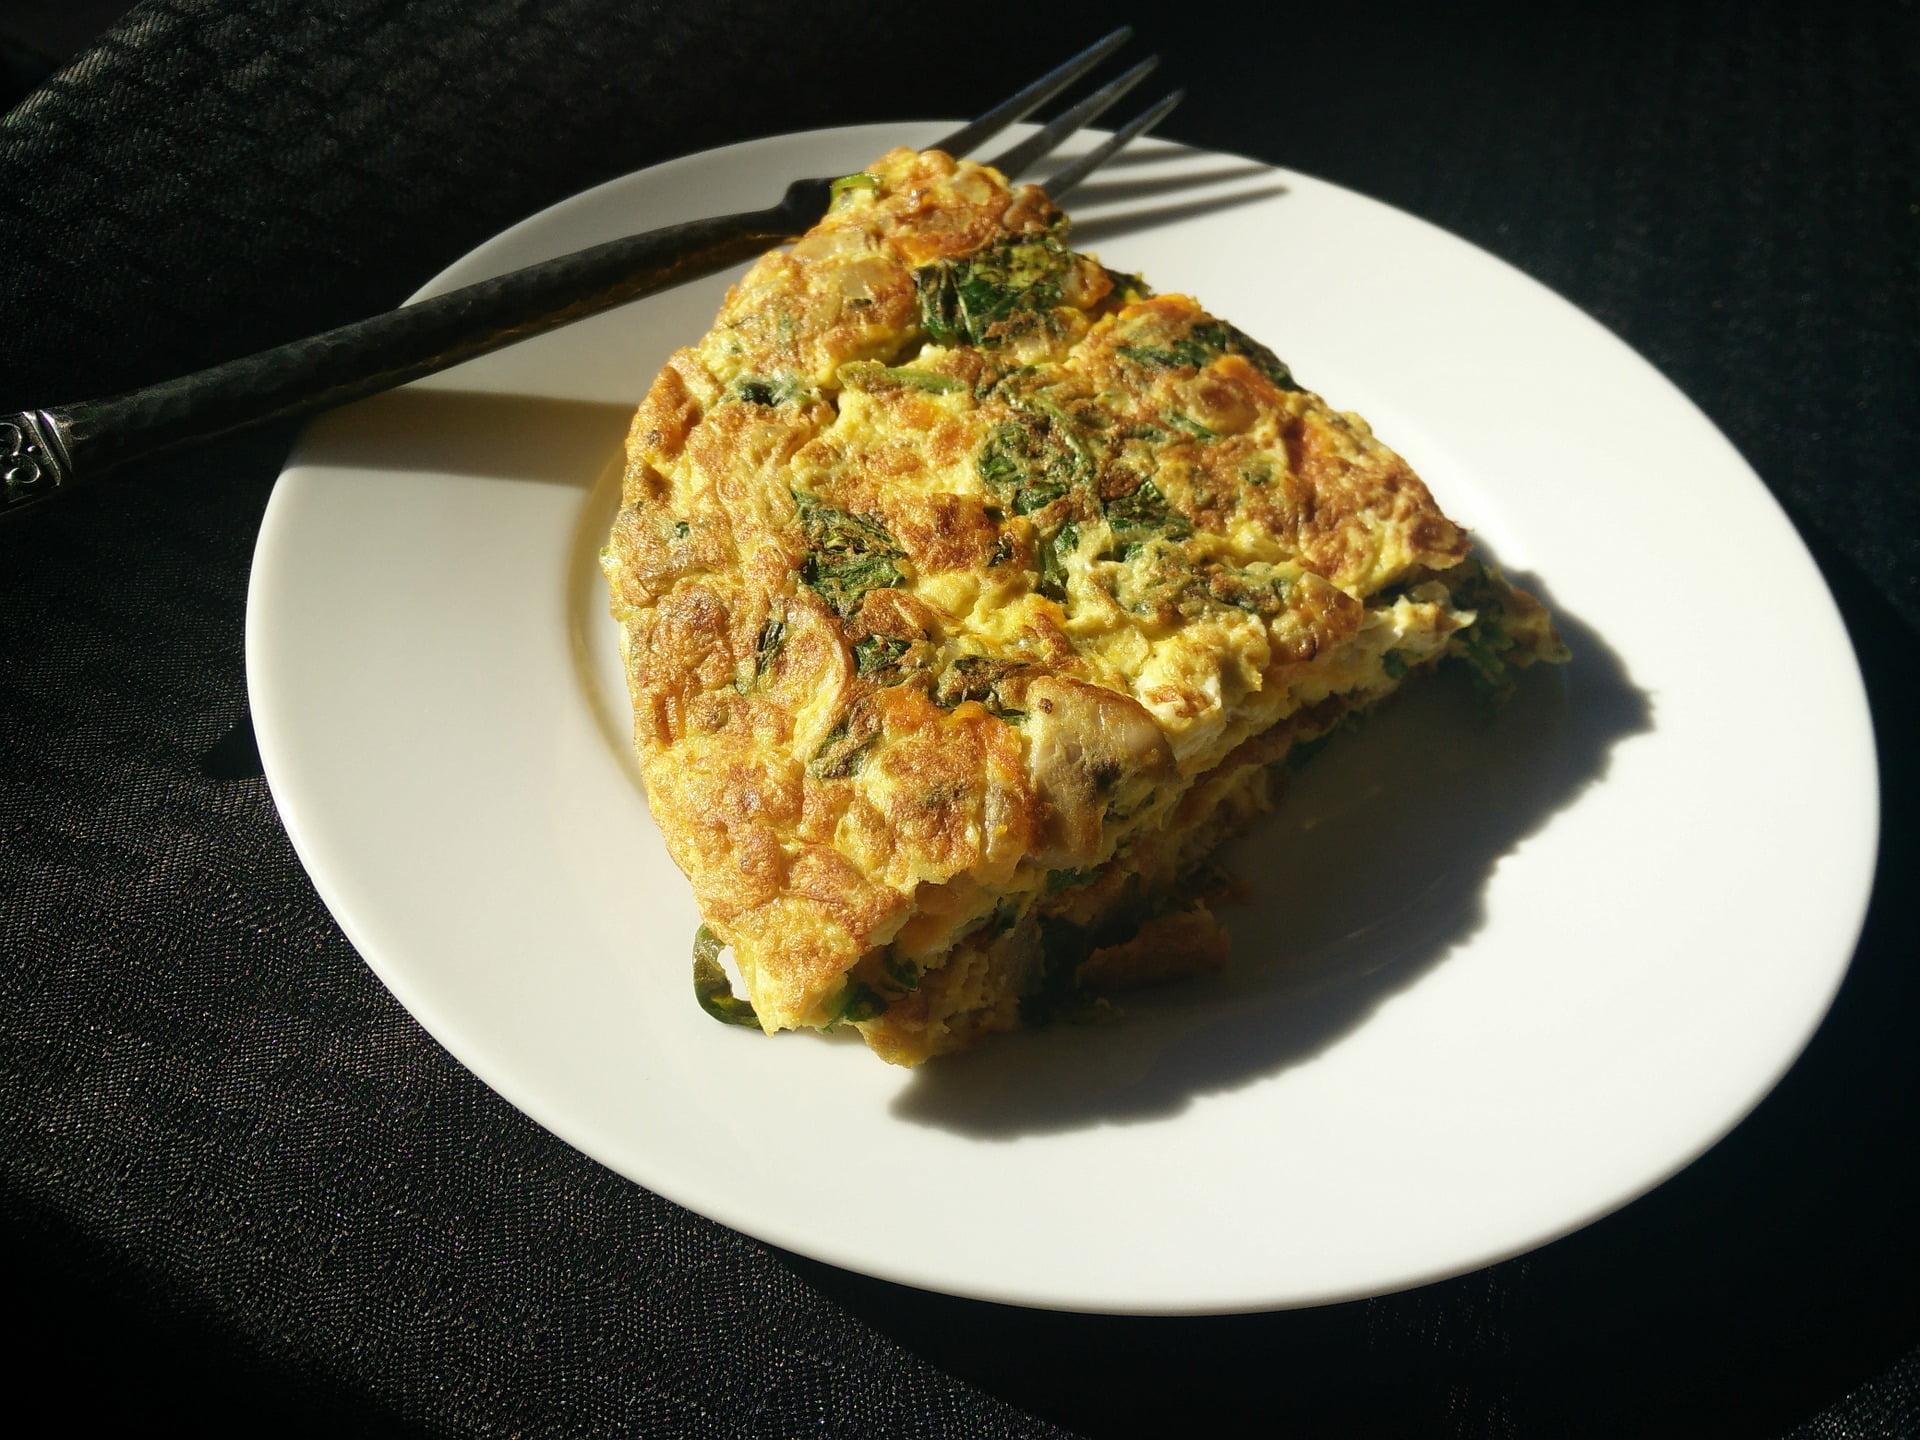 Omelett mit Avocado oder Guacamole